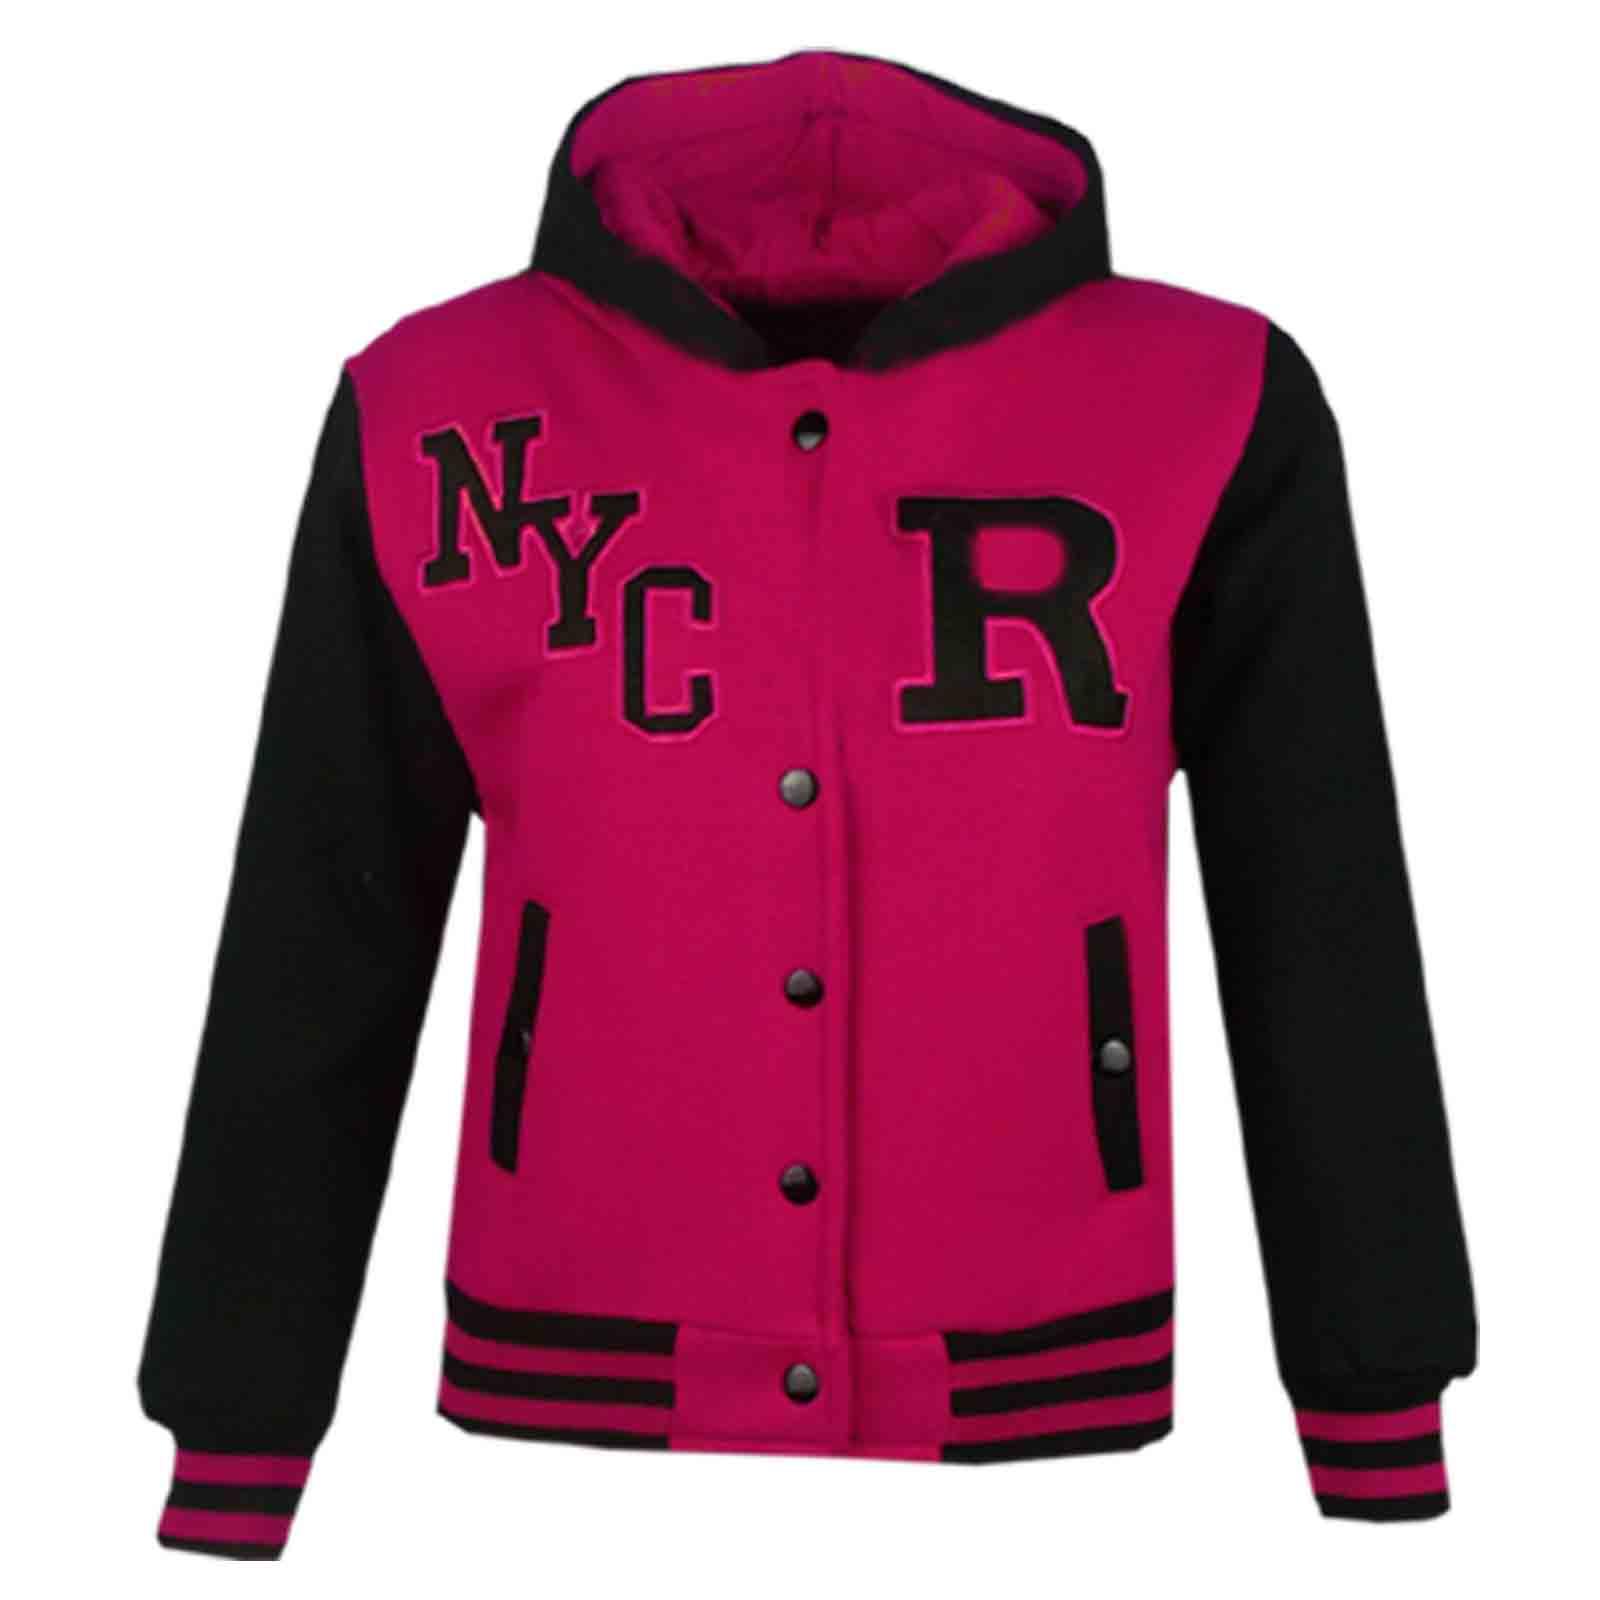 Kids Girls Boys R Fashion NYC FOX Baseball Hooded Jacket Varsity Hoodie 2-13 Yrs | EBay